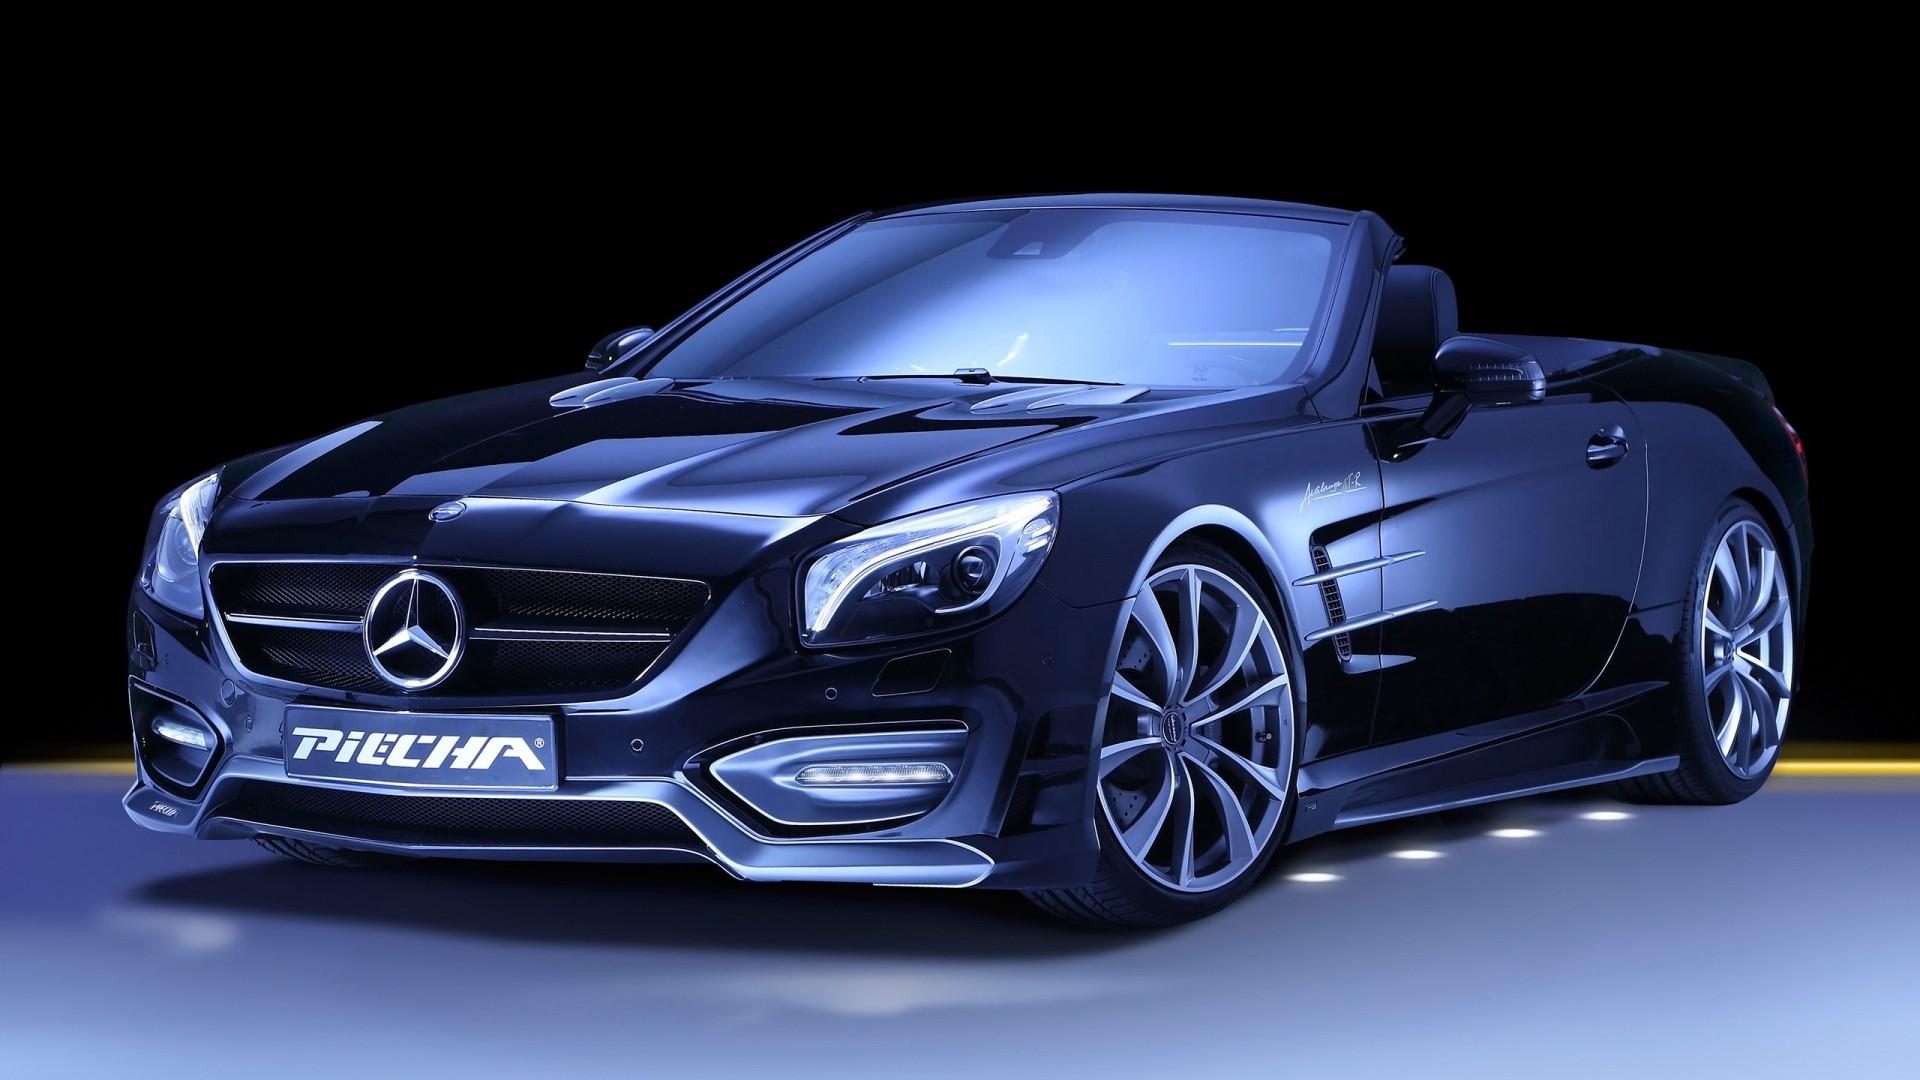 2014 Piecha Design Mercedes Benz SL R231 Avalange GTR Wallpaper   HD ...